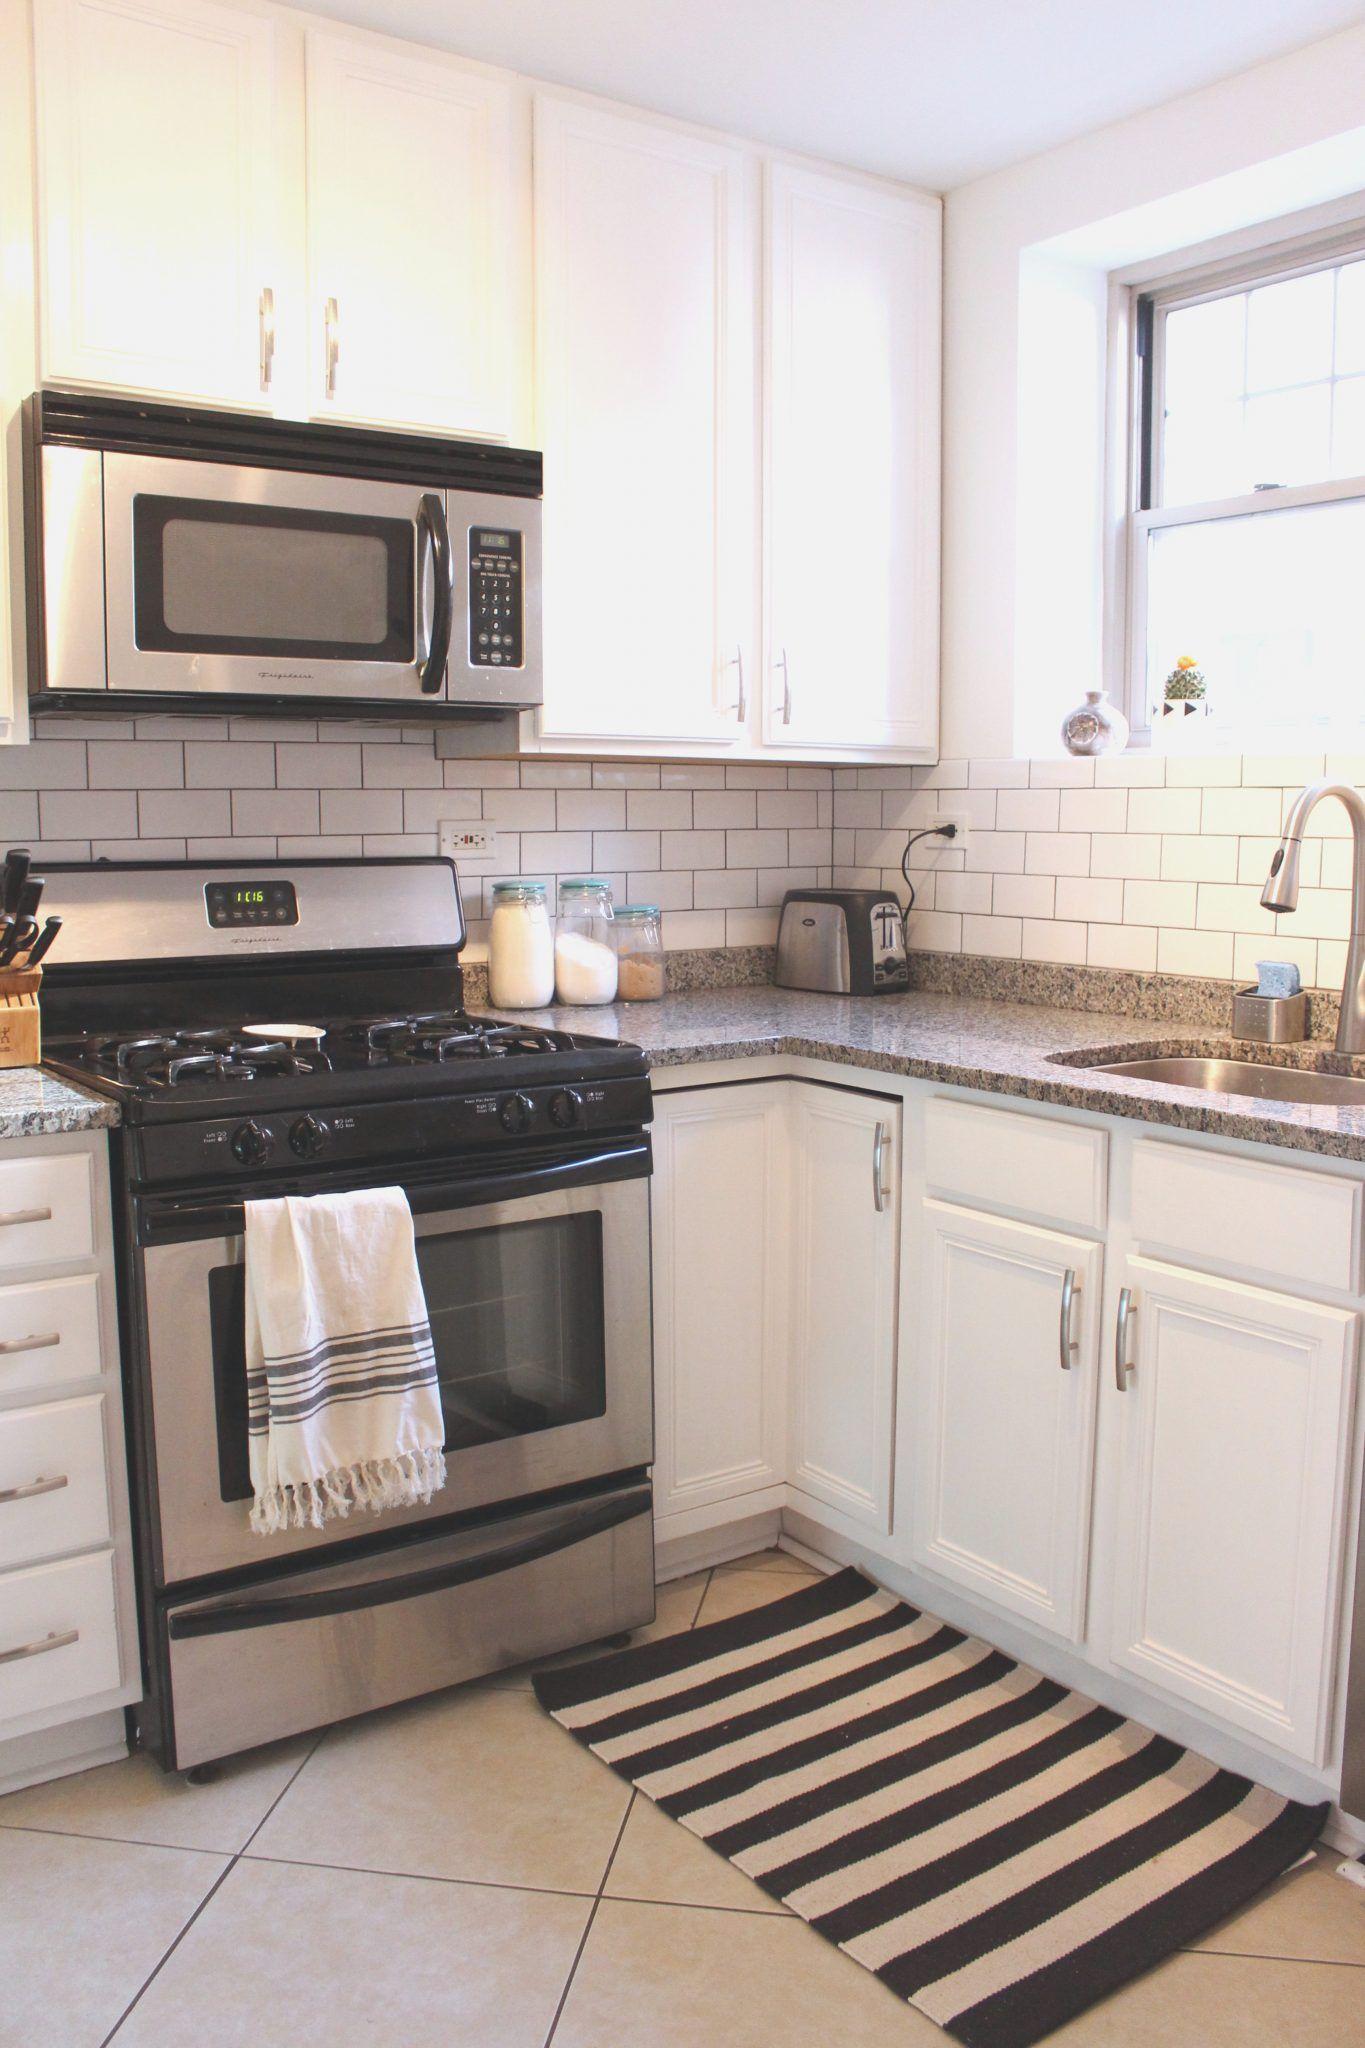 Black And White Kitchen Rug   Black And White Check Kitchen Rugs, Black And  White